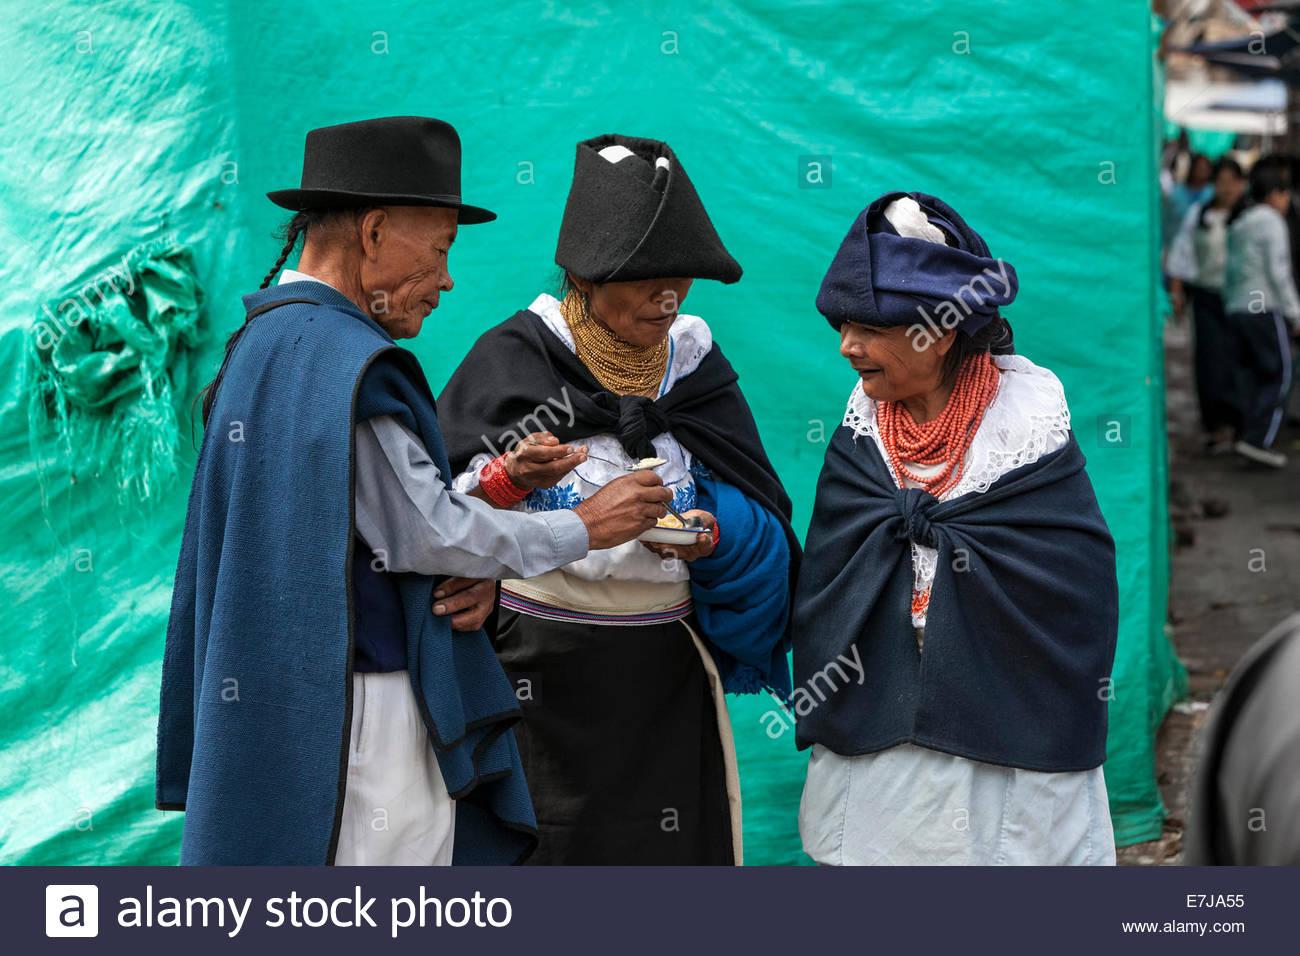 Indigenous people in Otavalo, Ecuador - Stock Image